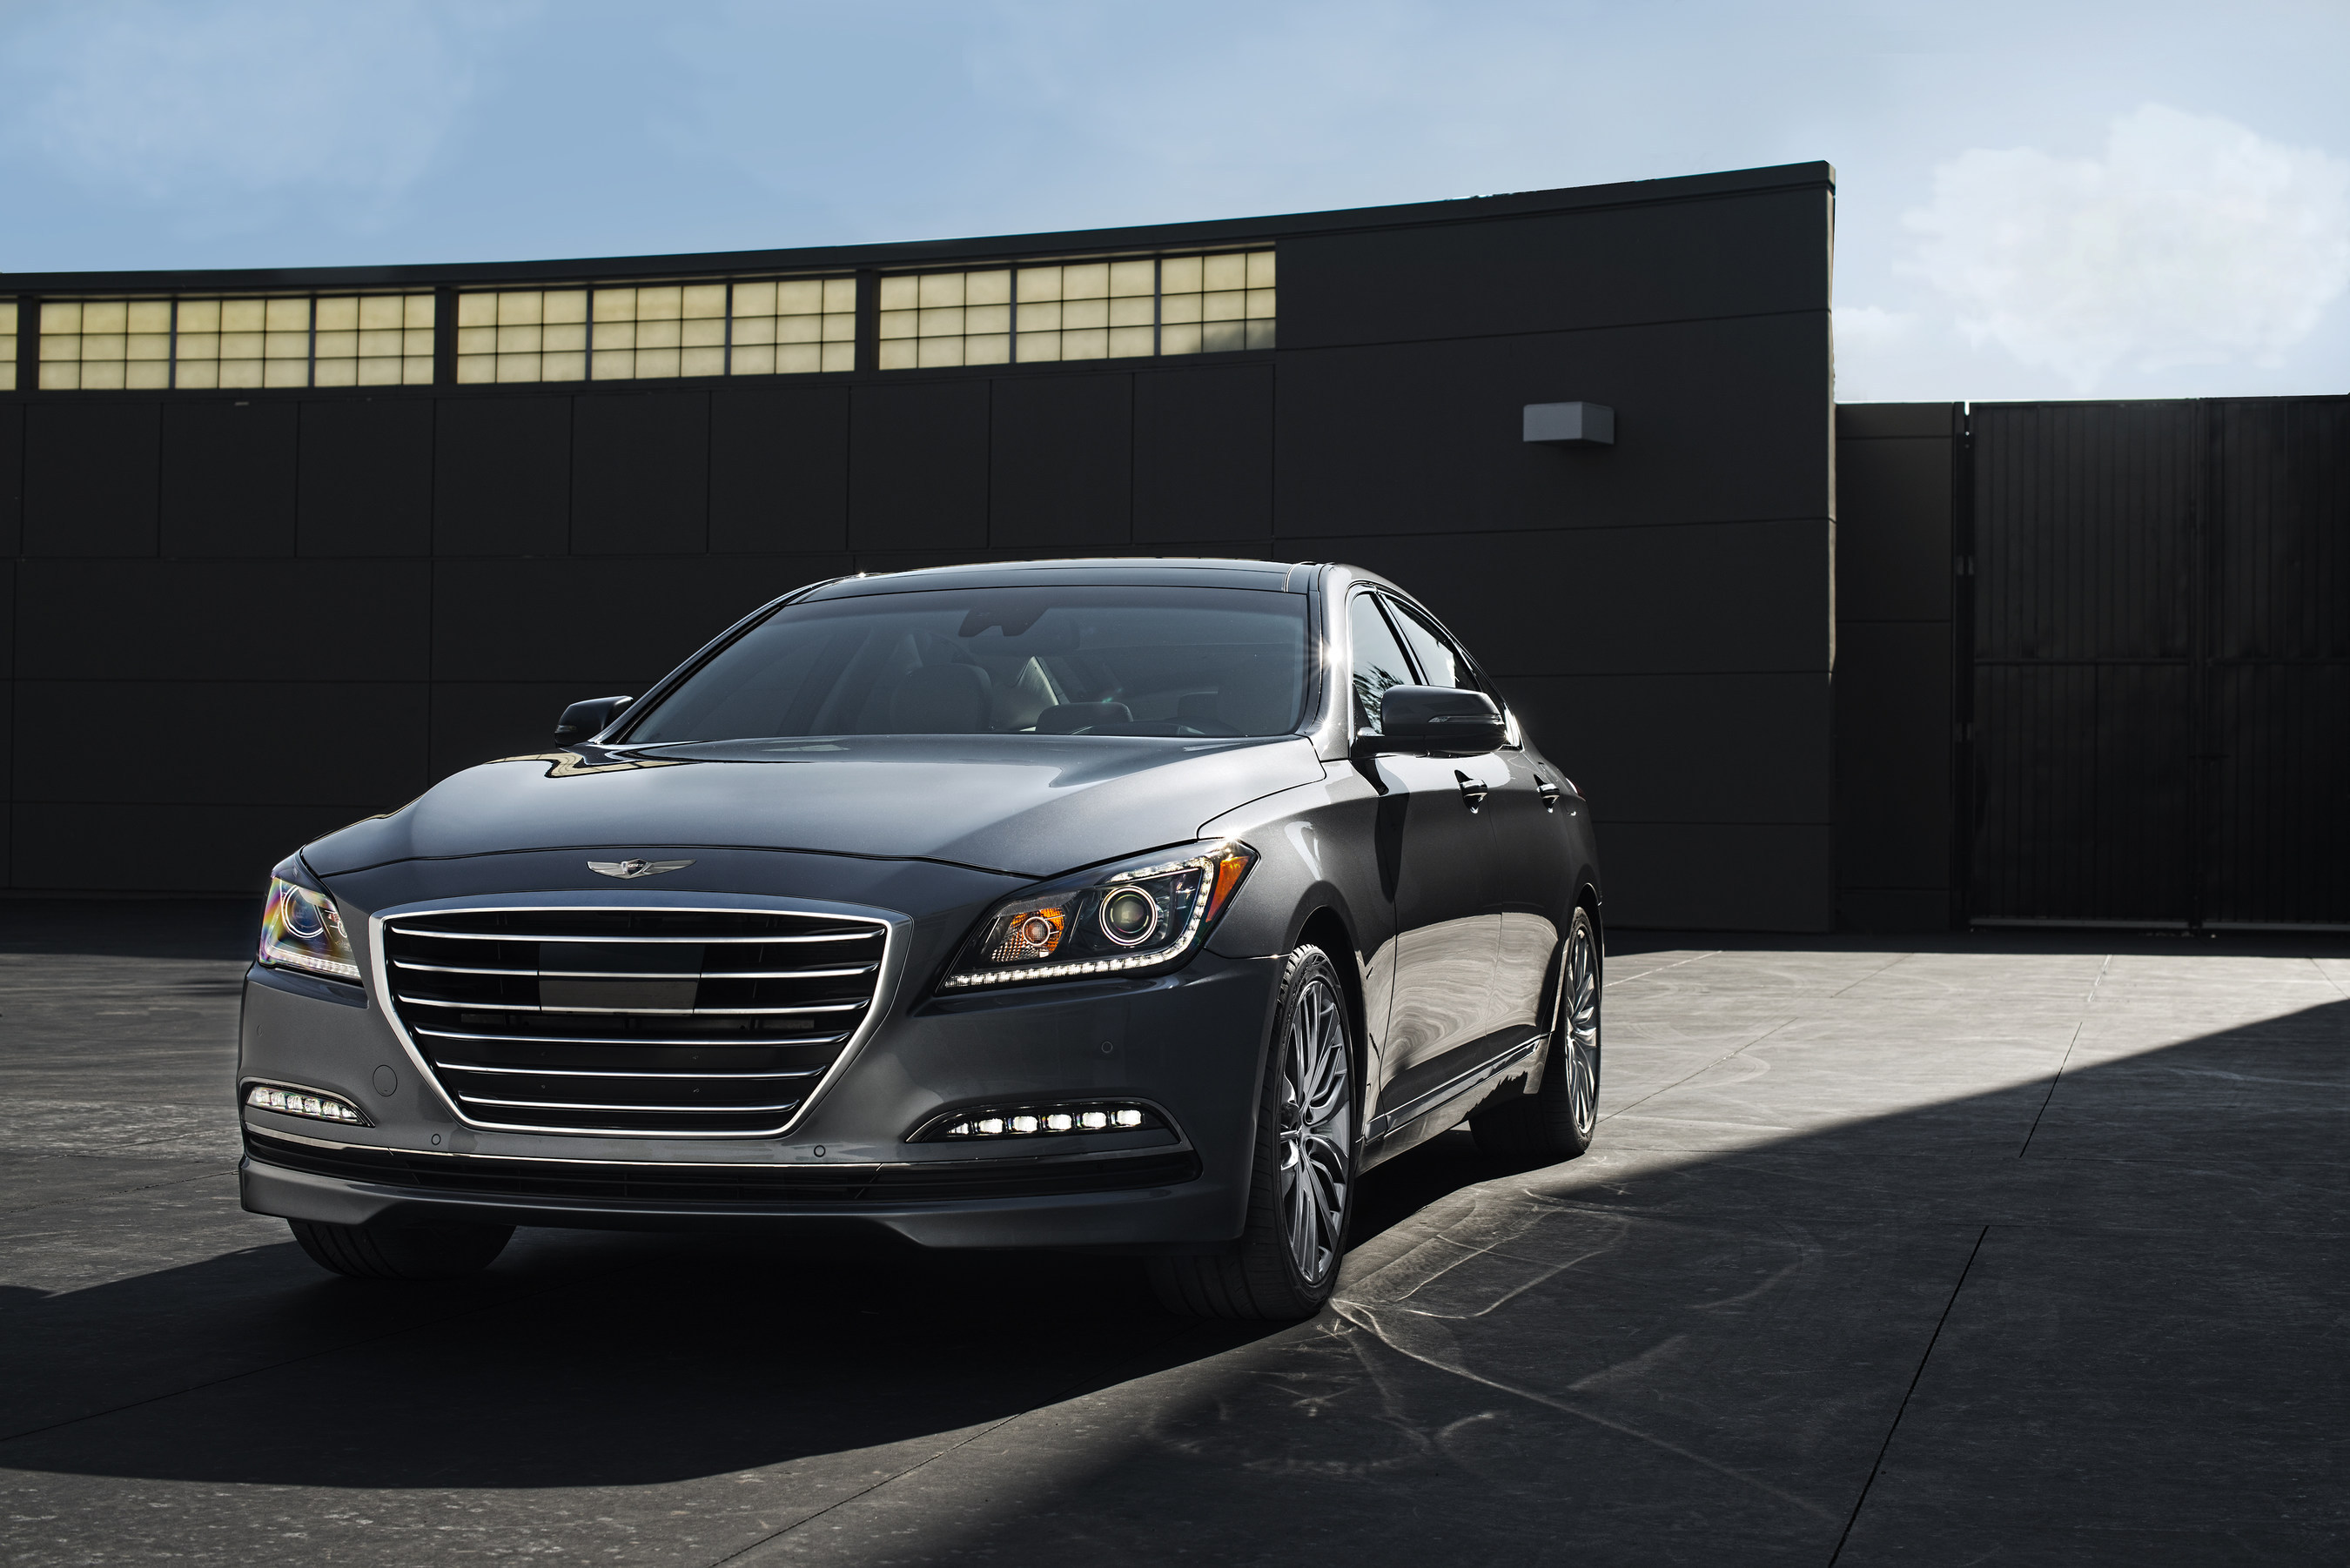 Hyundai Genesis - Finalist For 2015 North American Car Of The Year